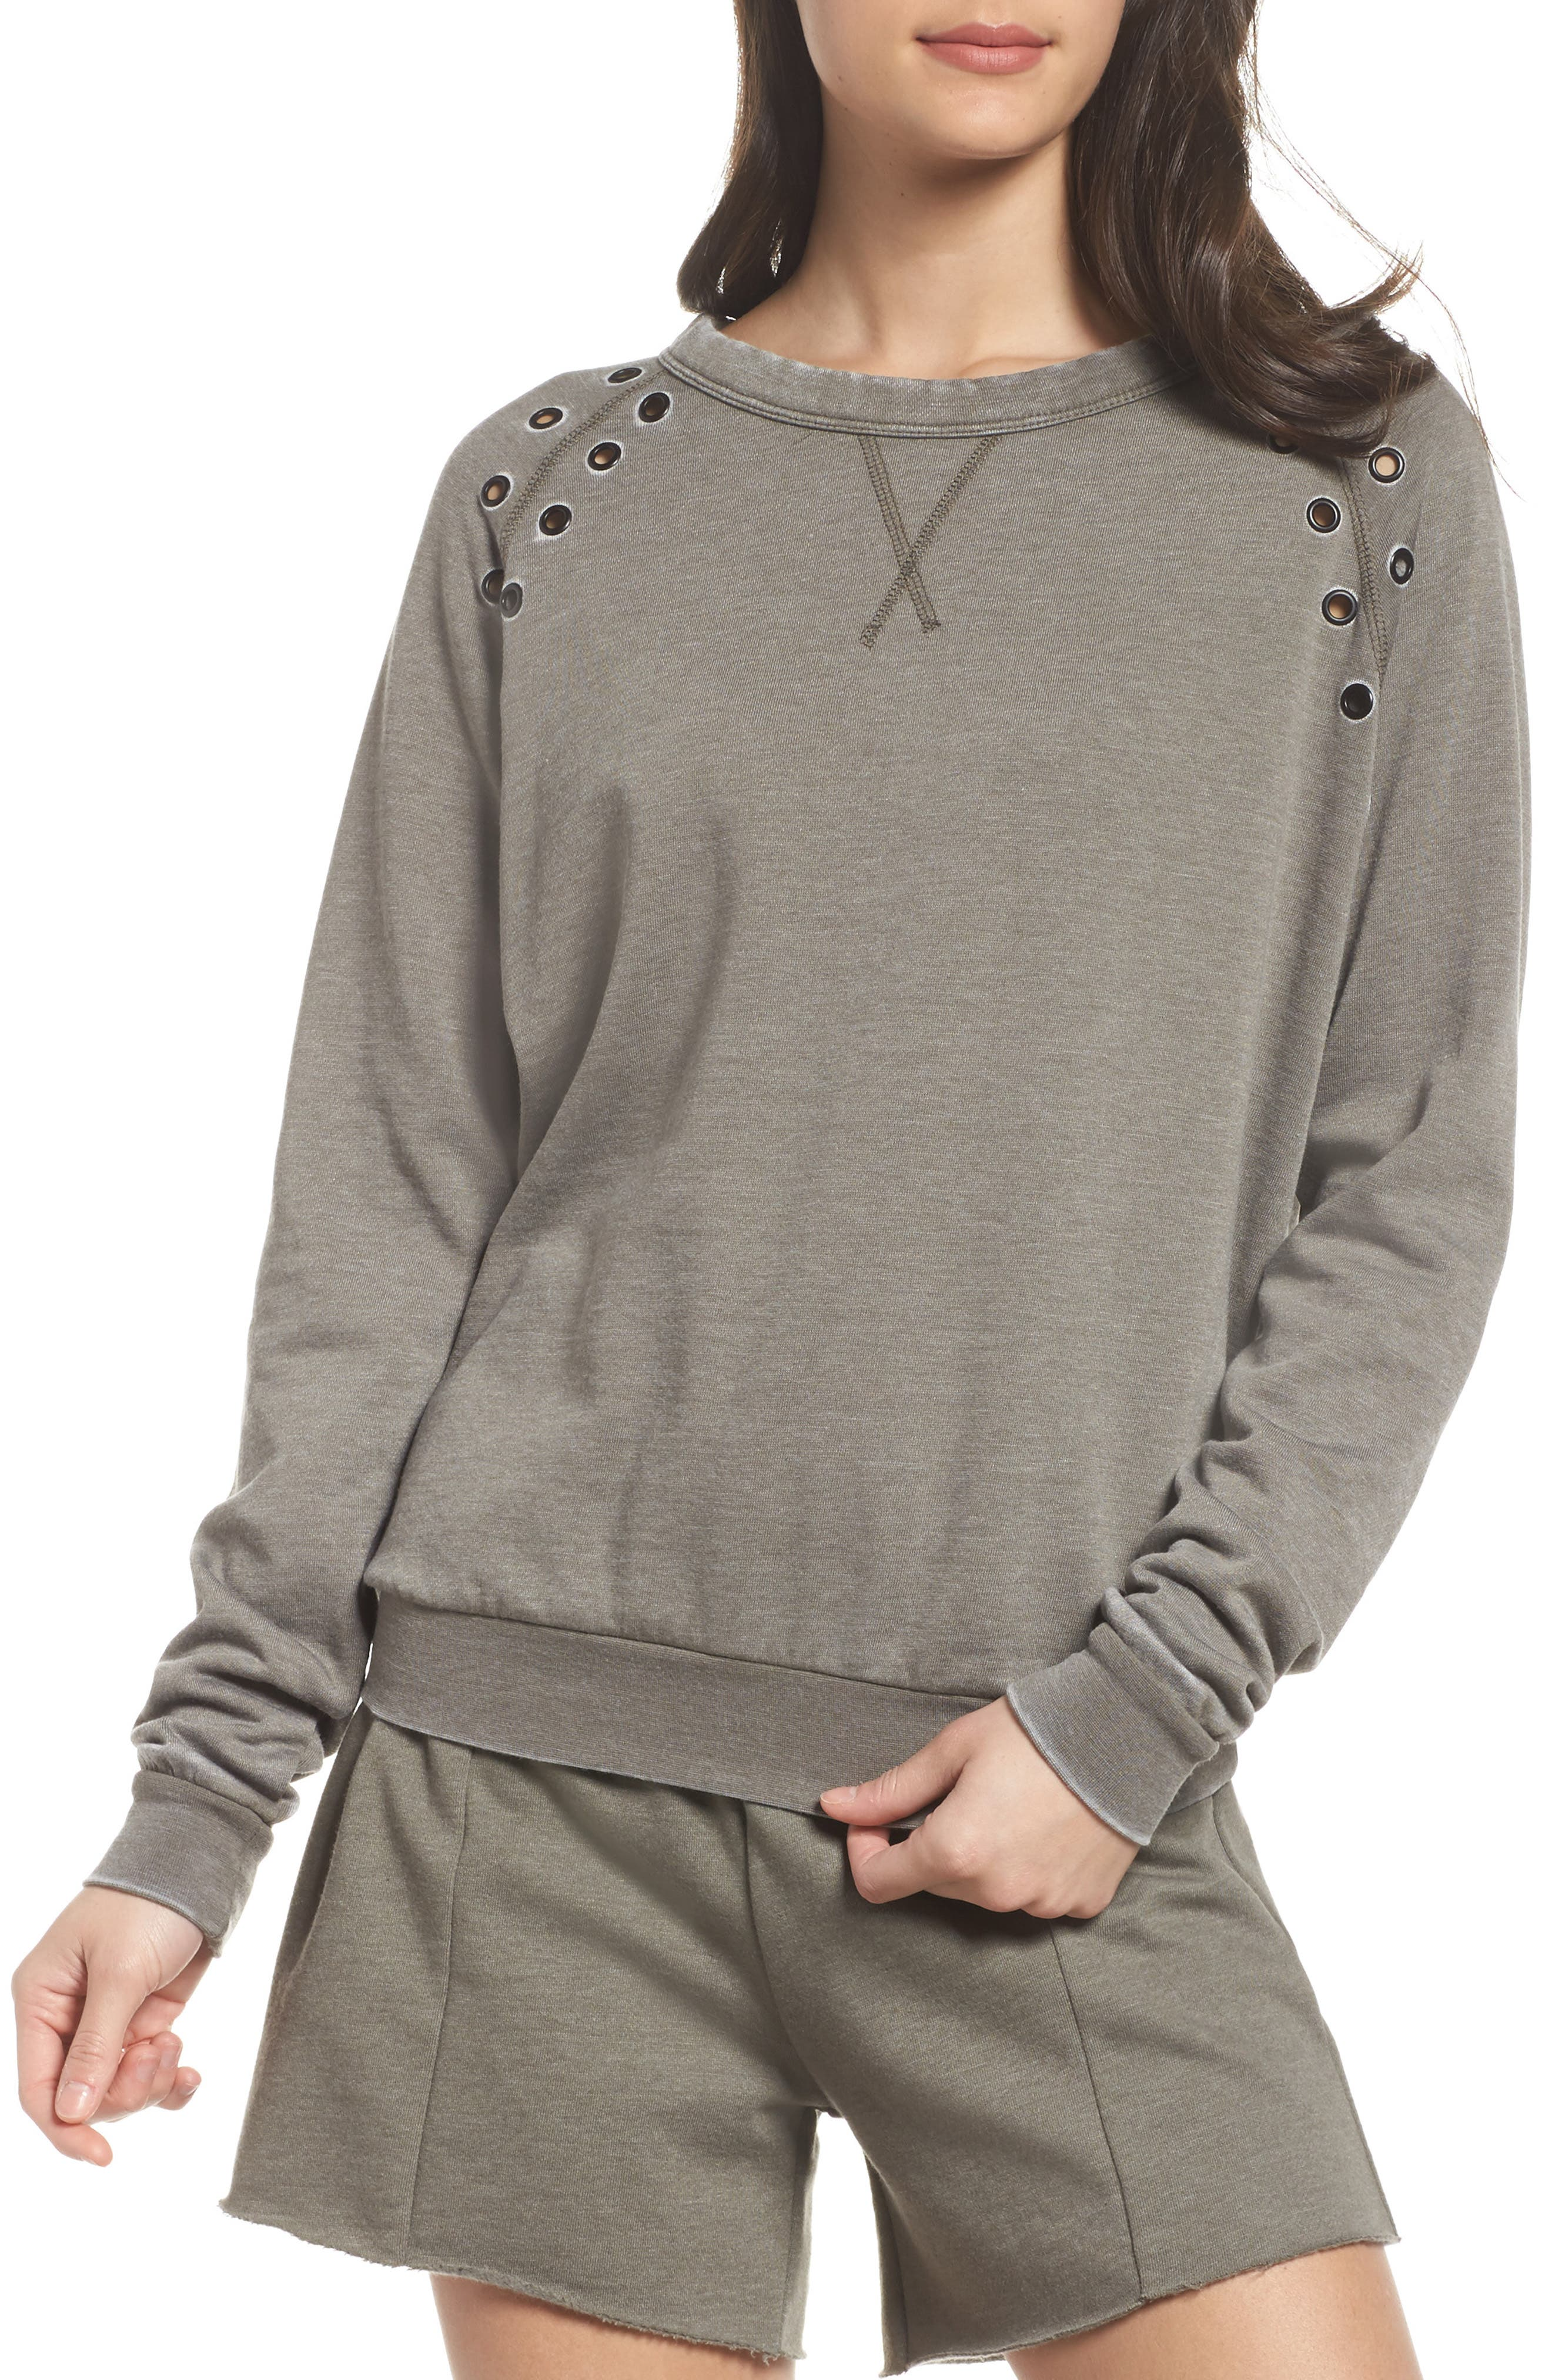 The Laundry Room Grommet Sweatshirt